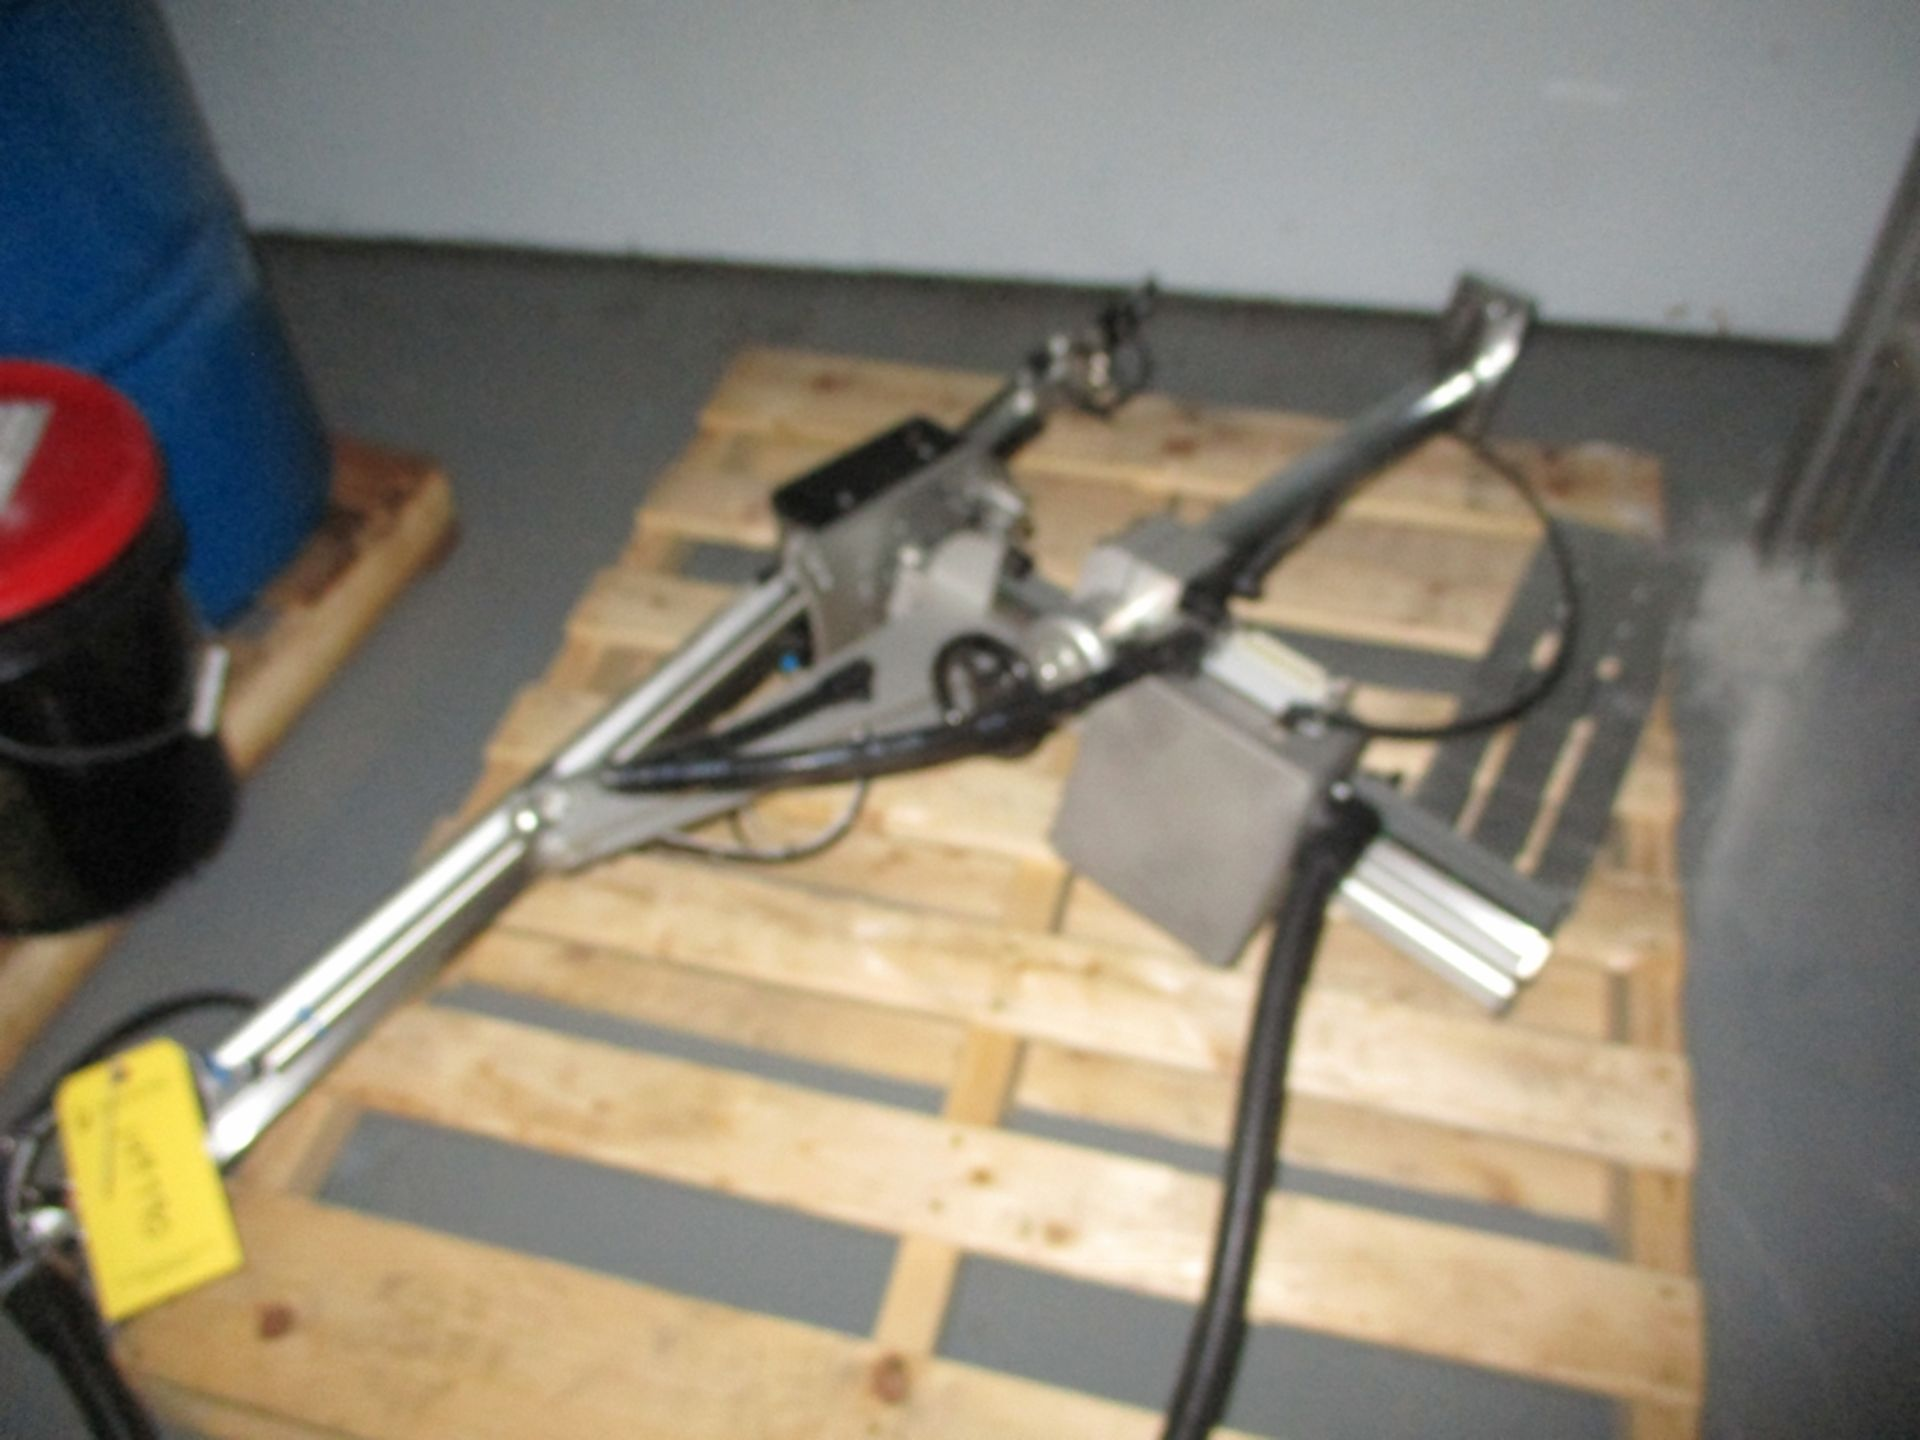 Lot 1026 - Sytrama SP100-S Manipulator Arm